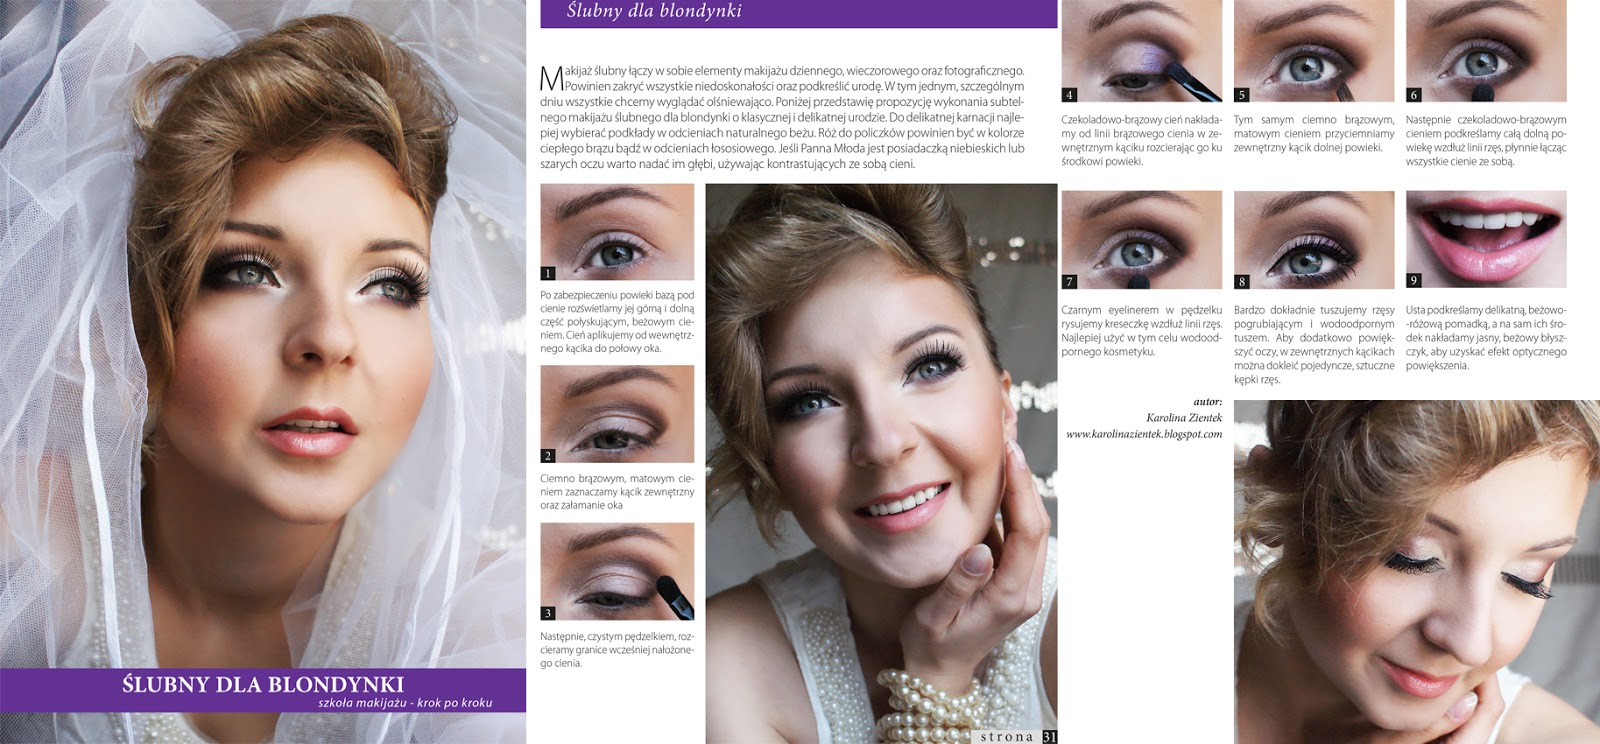 Karolina Zientek Makeup Blog Makijaż ślubny Dla Blondynki